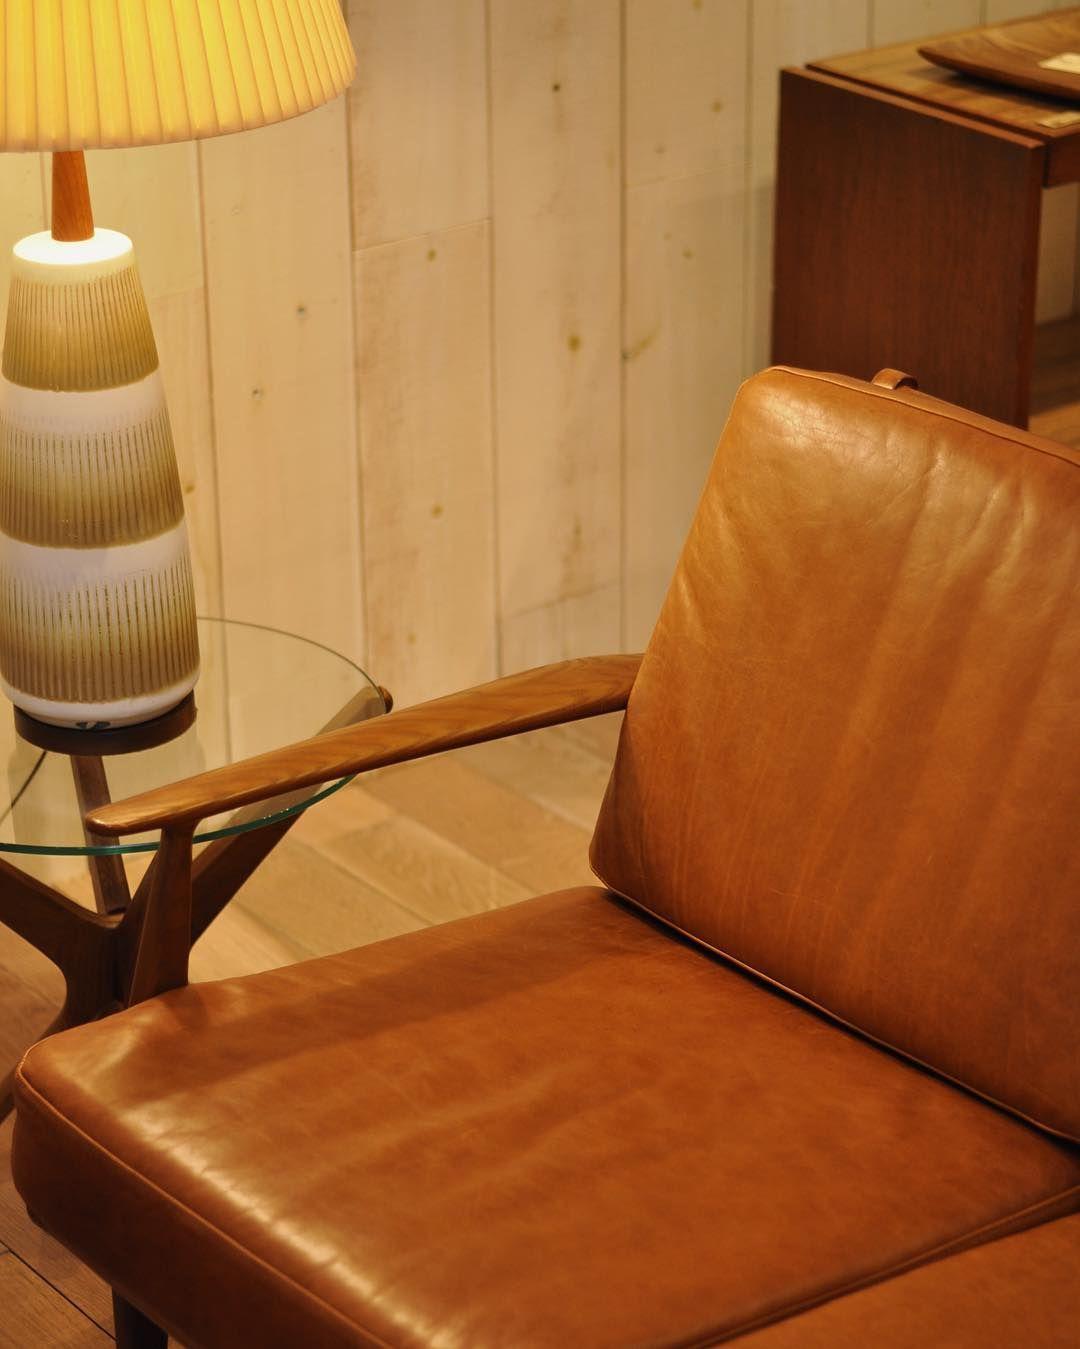 #DelmarSofa 182000 #acme#furniture#acmefurniture#acmejiyugaoka  #trestlessidetable#lifestyle #